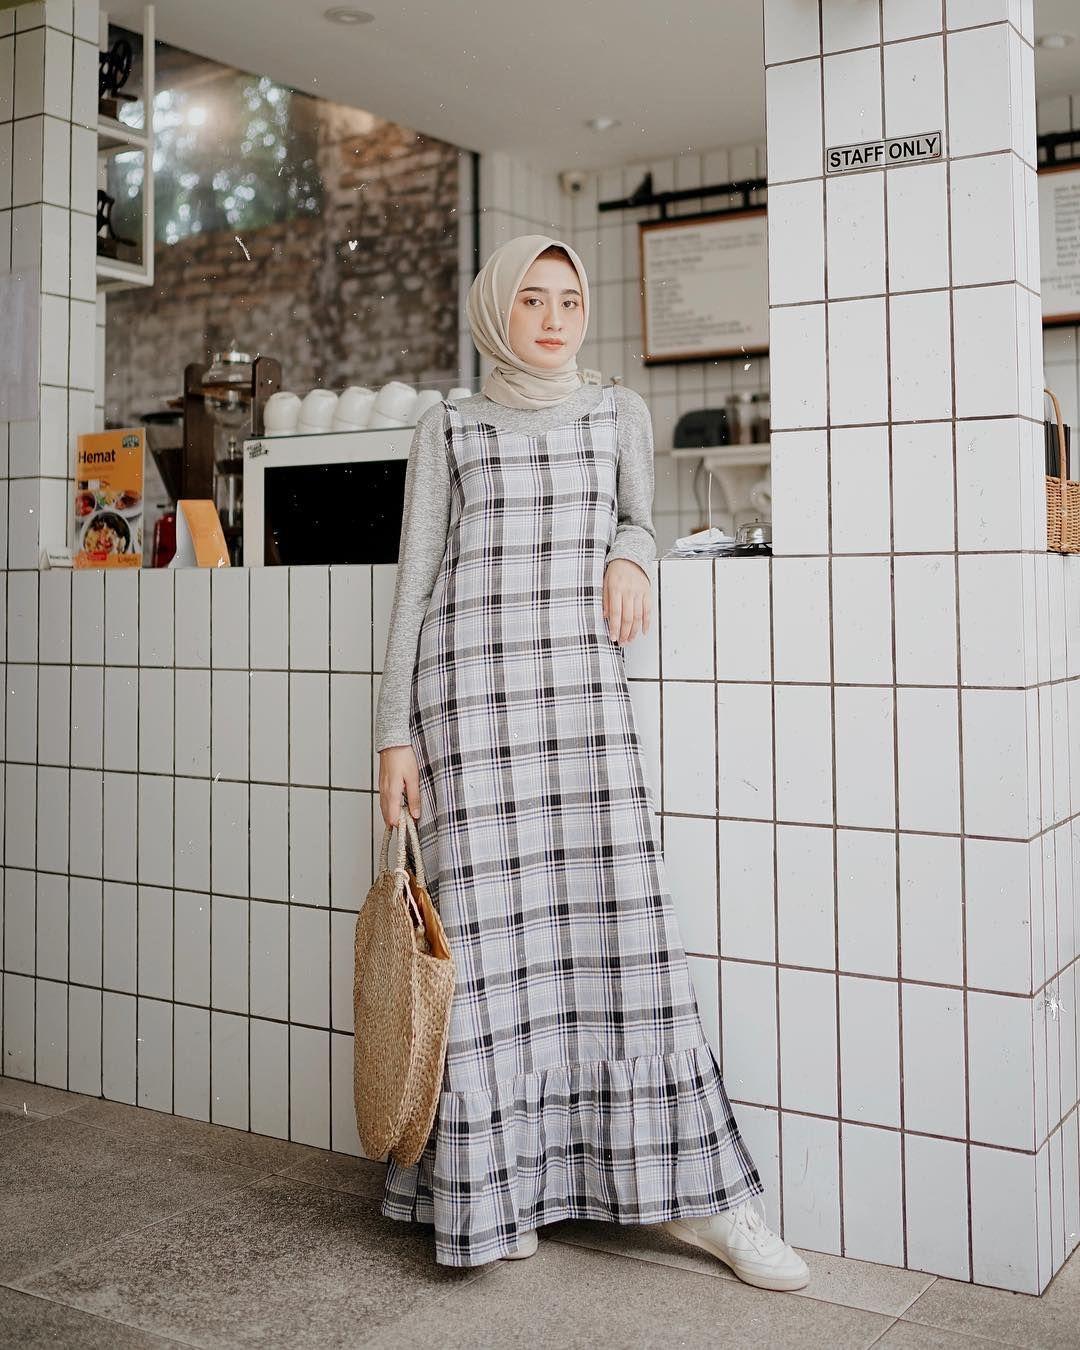 Amy Di Instagram Gemes Syekali Overall Dressnya Clo Id